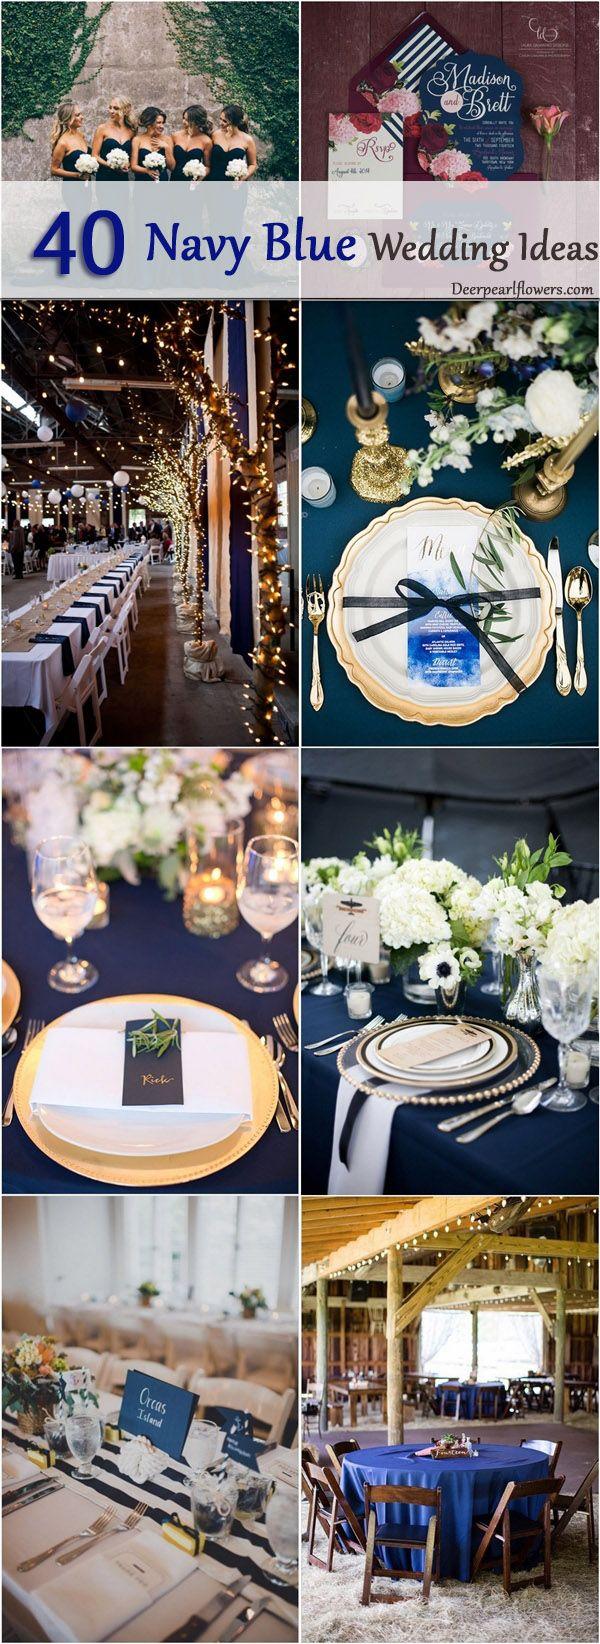 Blue and white wedding decor   best Barn Wedding Ideas for Britt images on Pinterest  Wedding